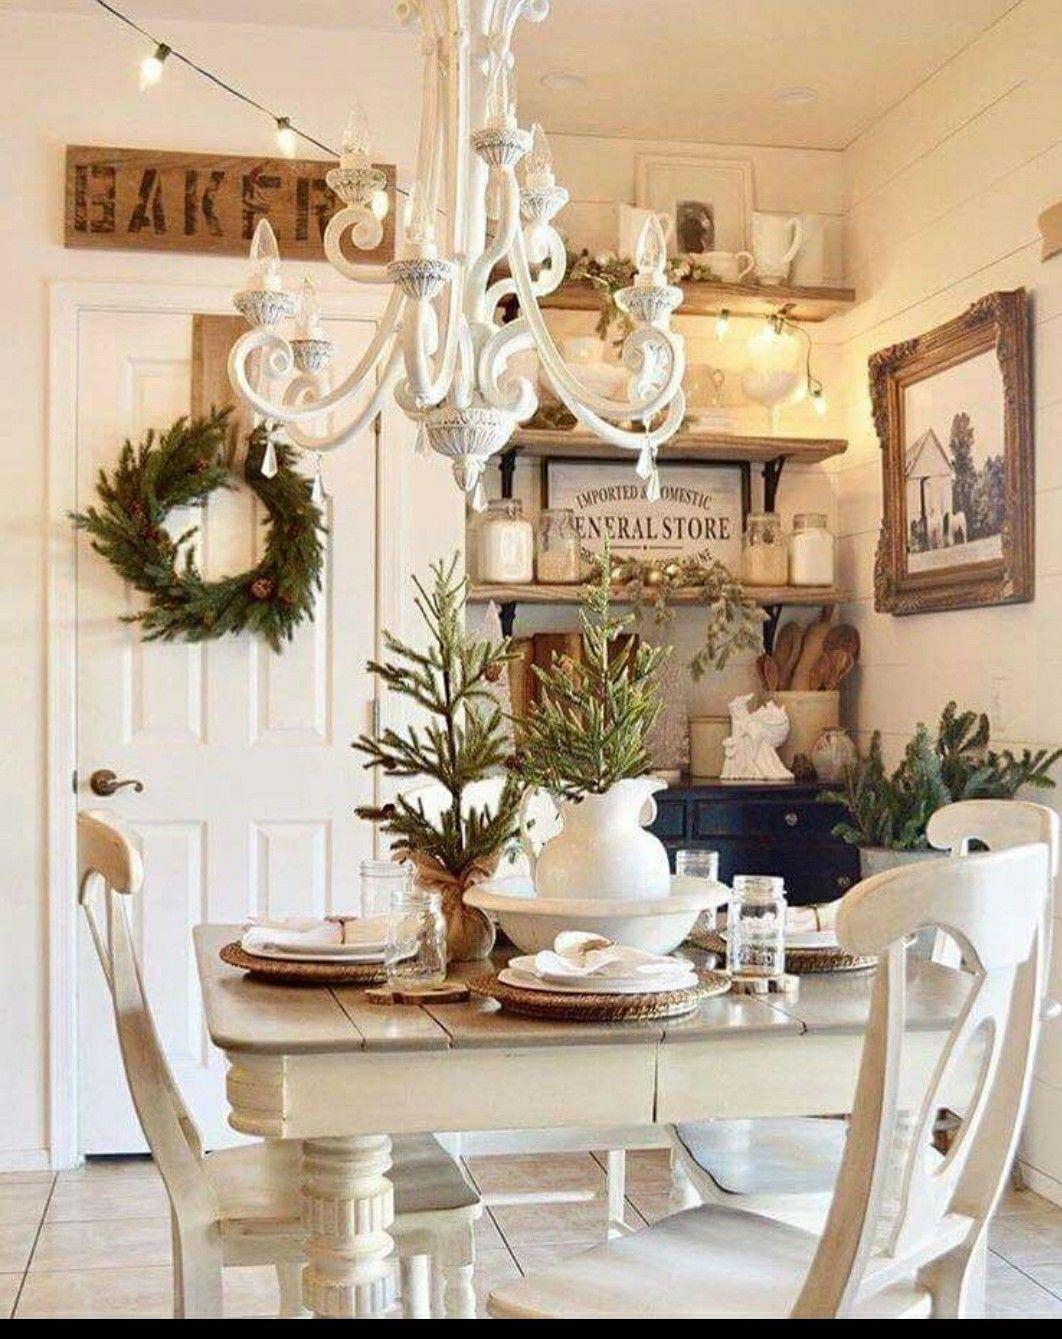 Pin de Tiziana Marin en Natale | Pinterest